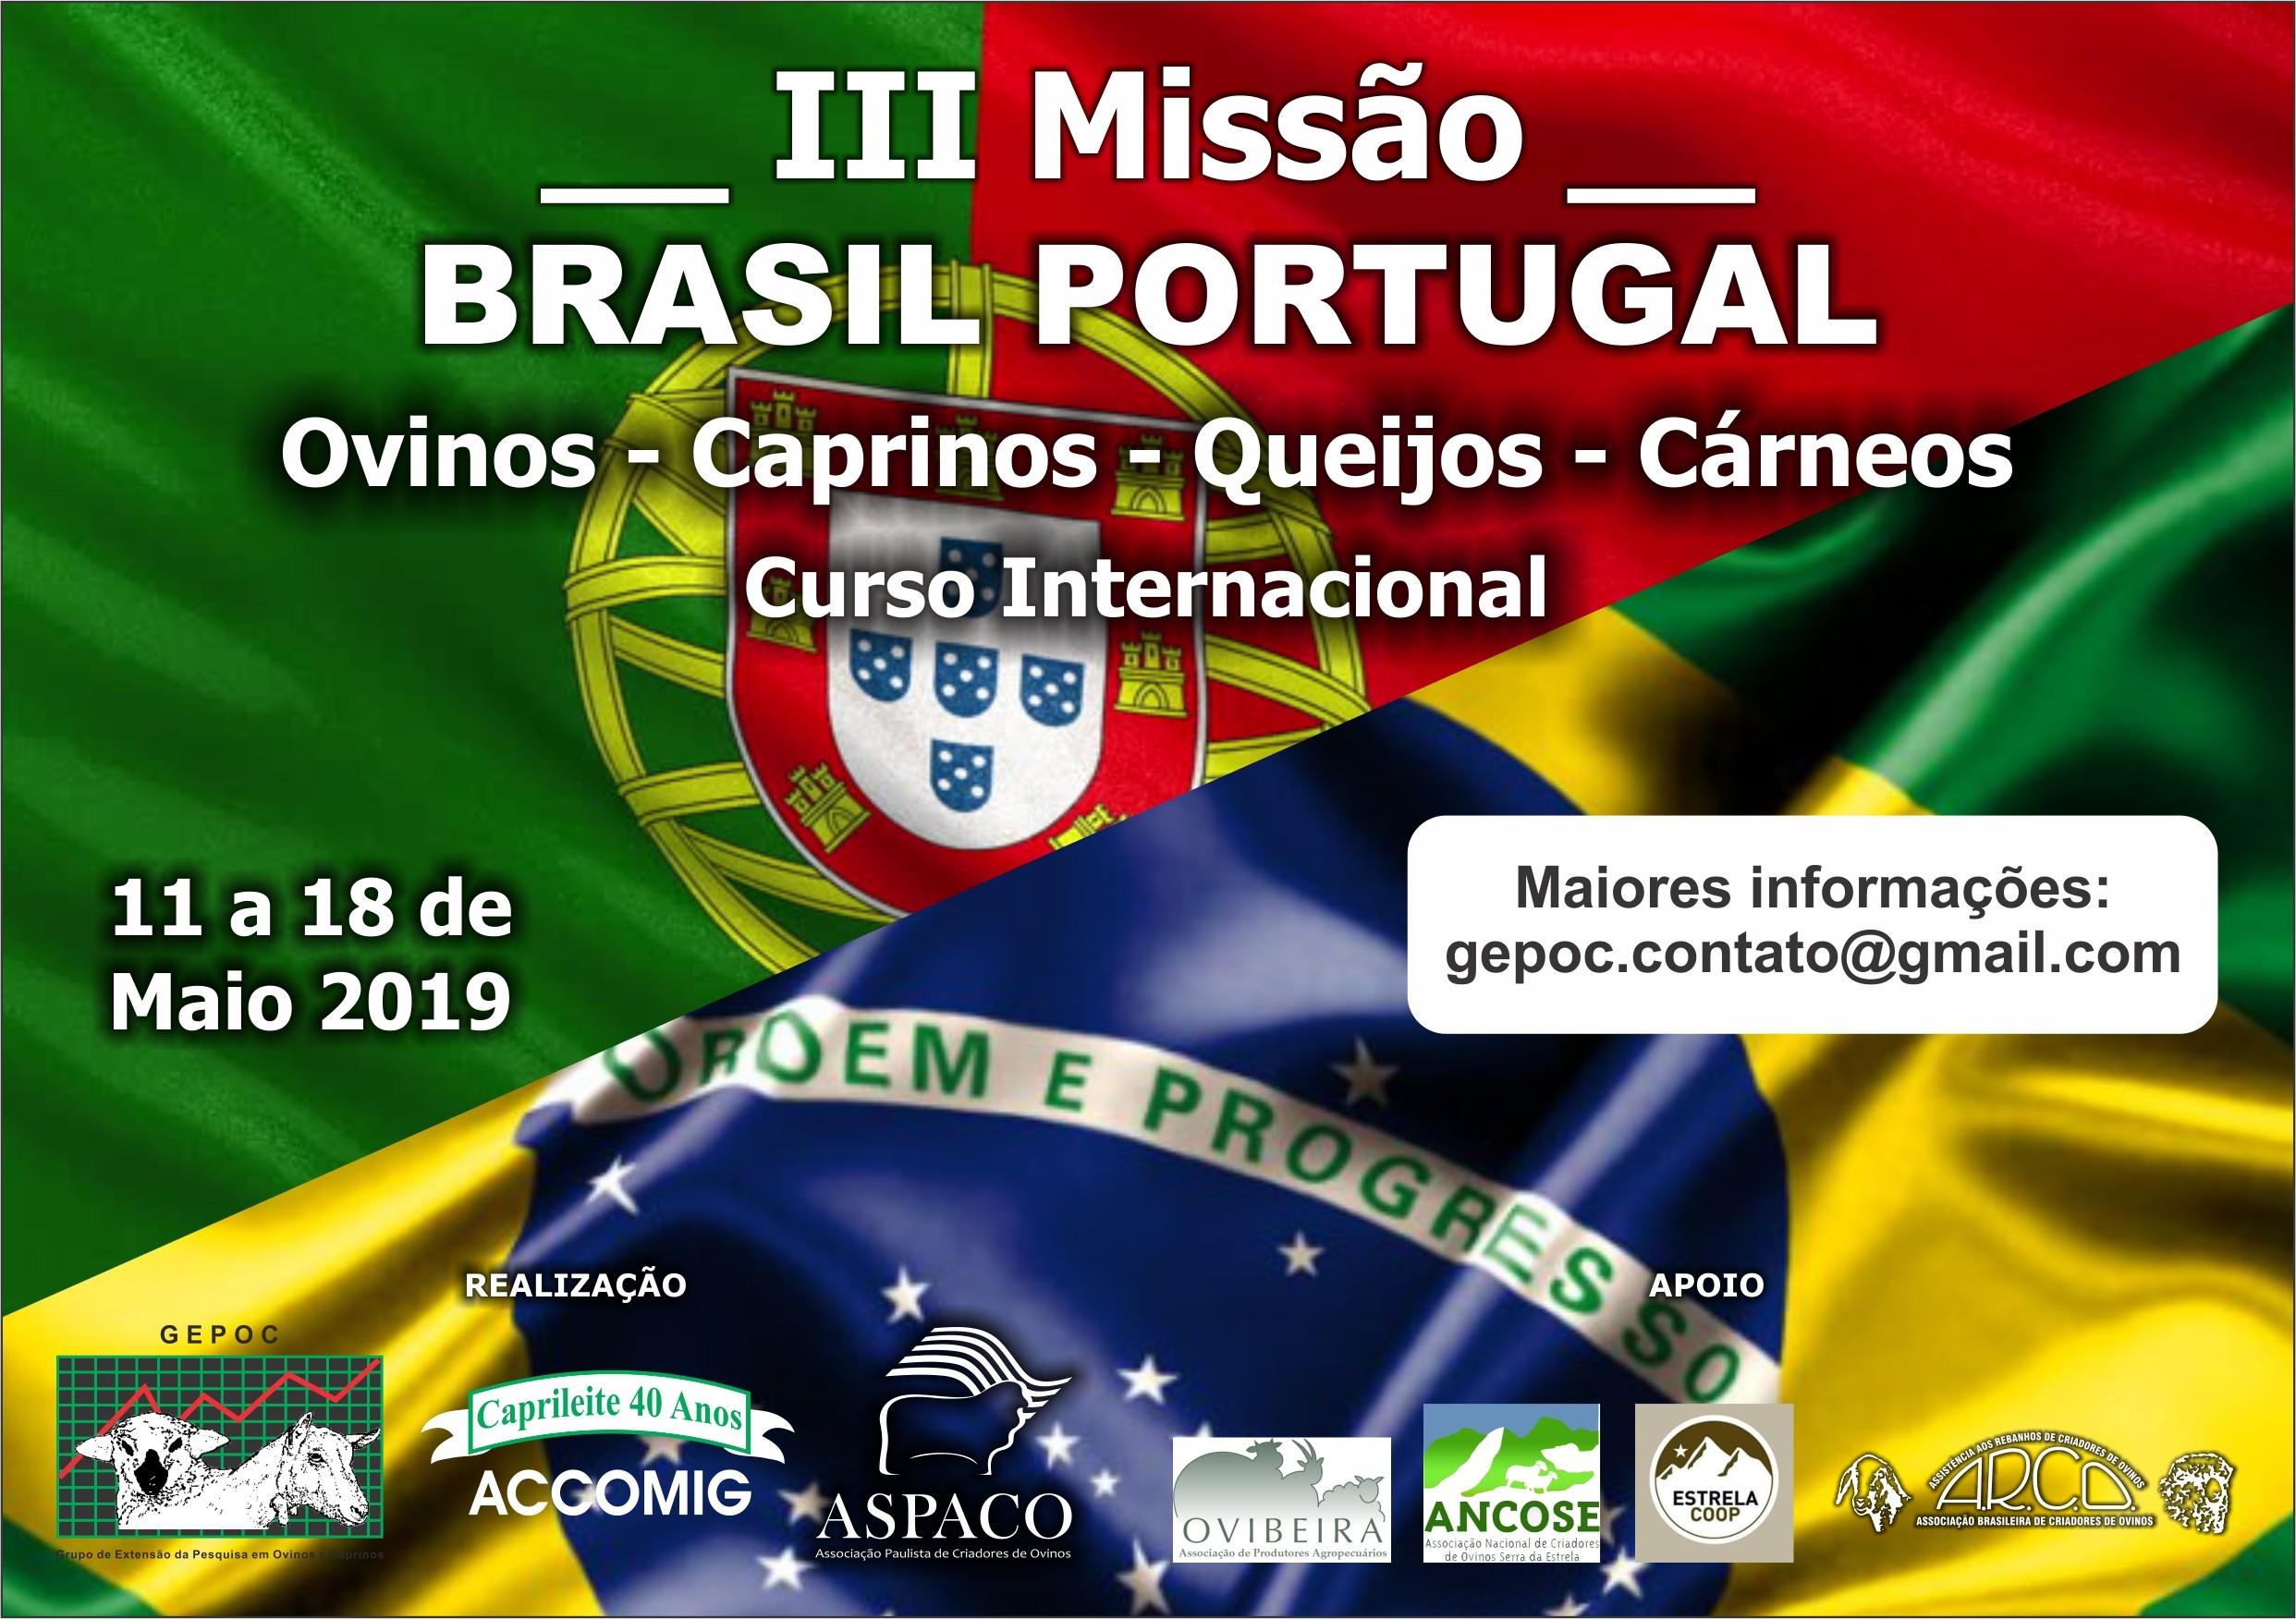 III MISSÃO BRASIL PORTUGAL 11 A 18/05/2019